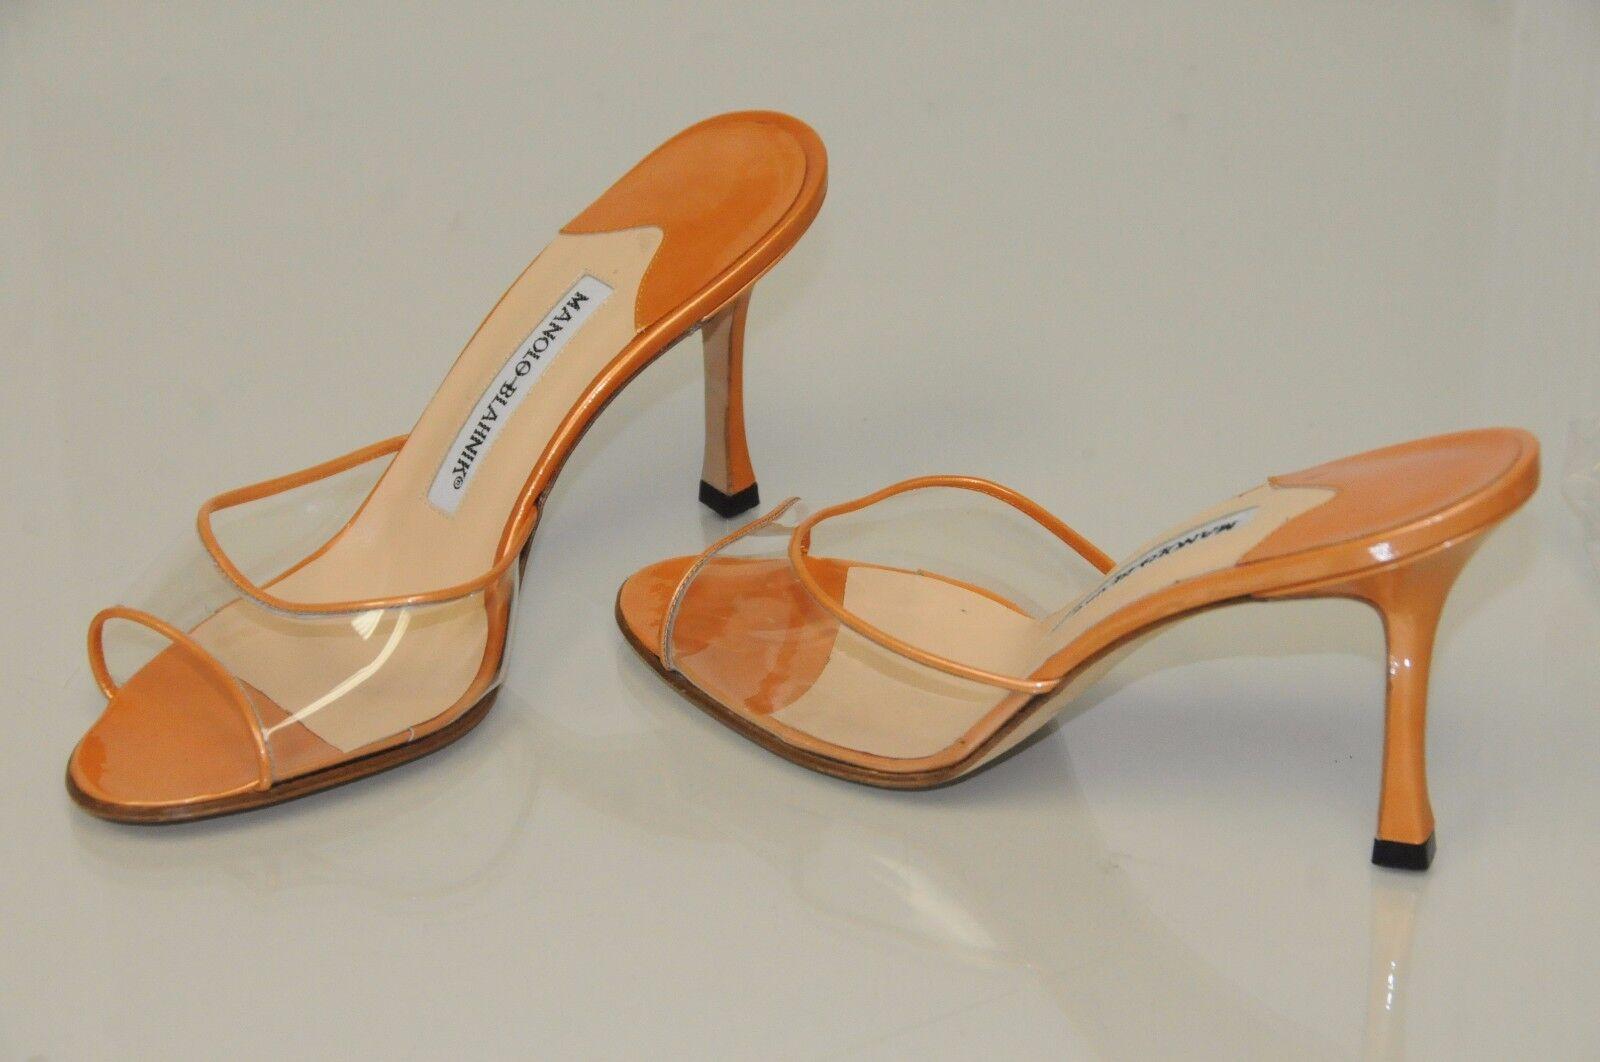 grande sconto  715 New MANOLO BLAHNIK arancia arancia arancia METALLIC ASTUTA Slide SANDALS HEELS scarpe 36  design unico